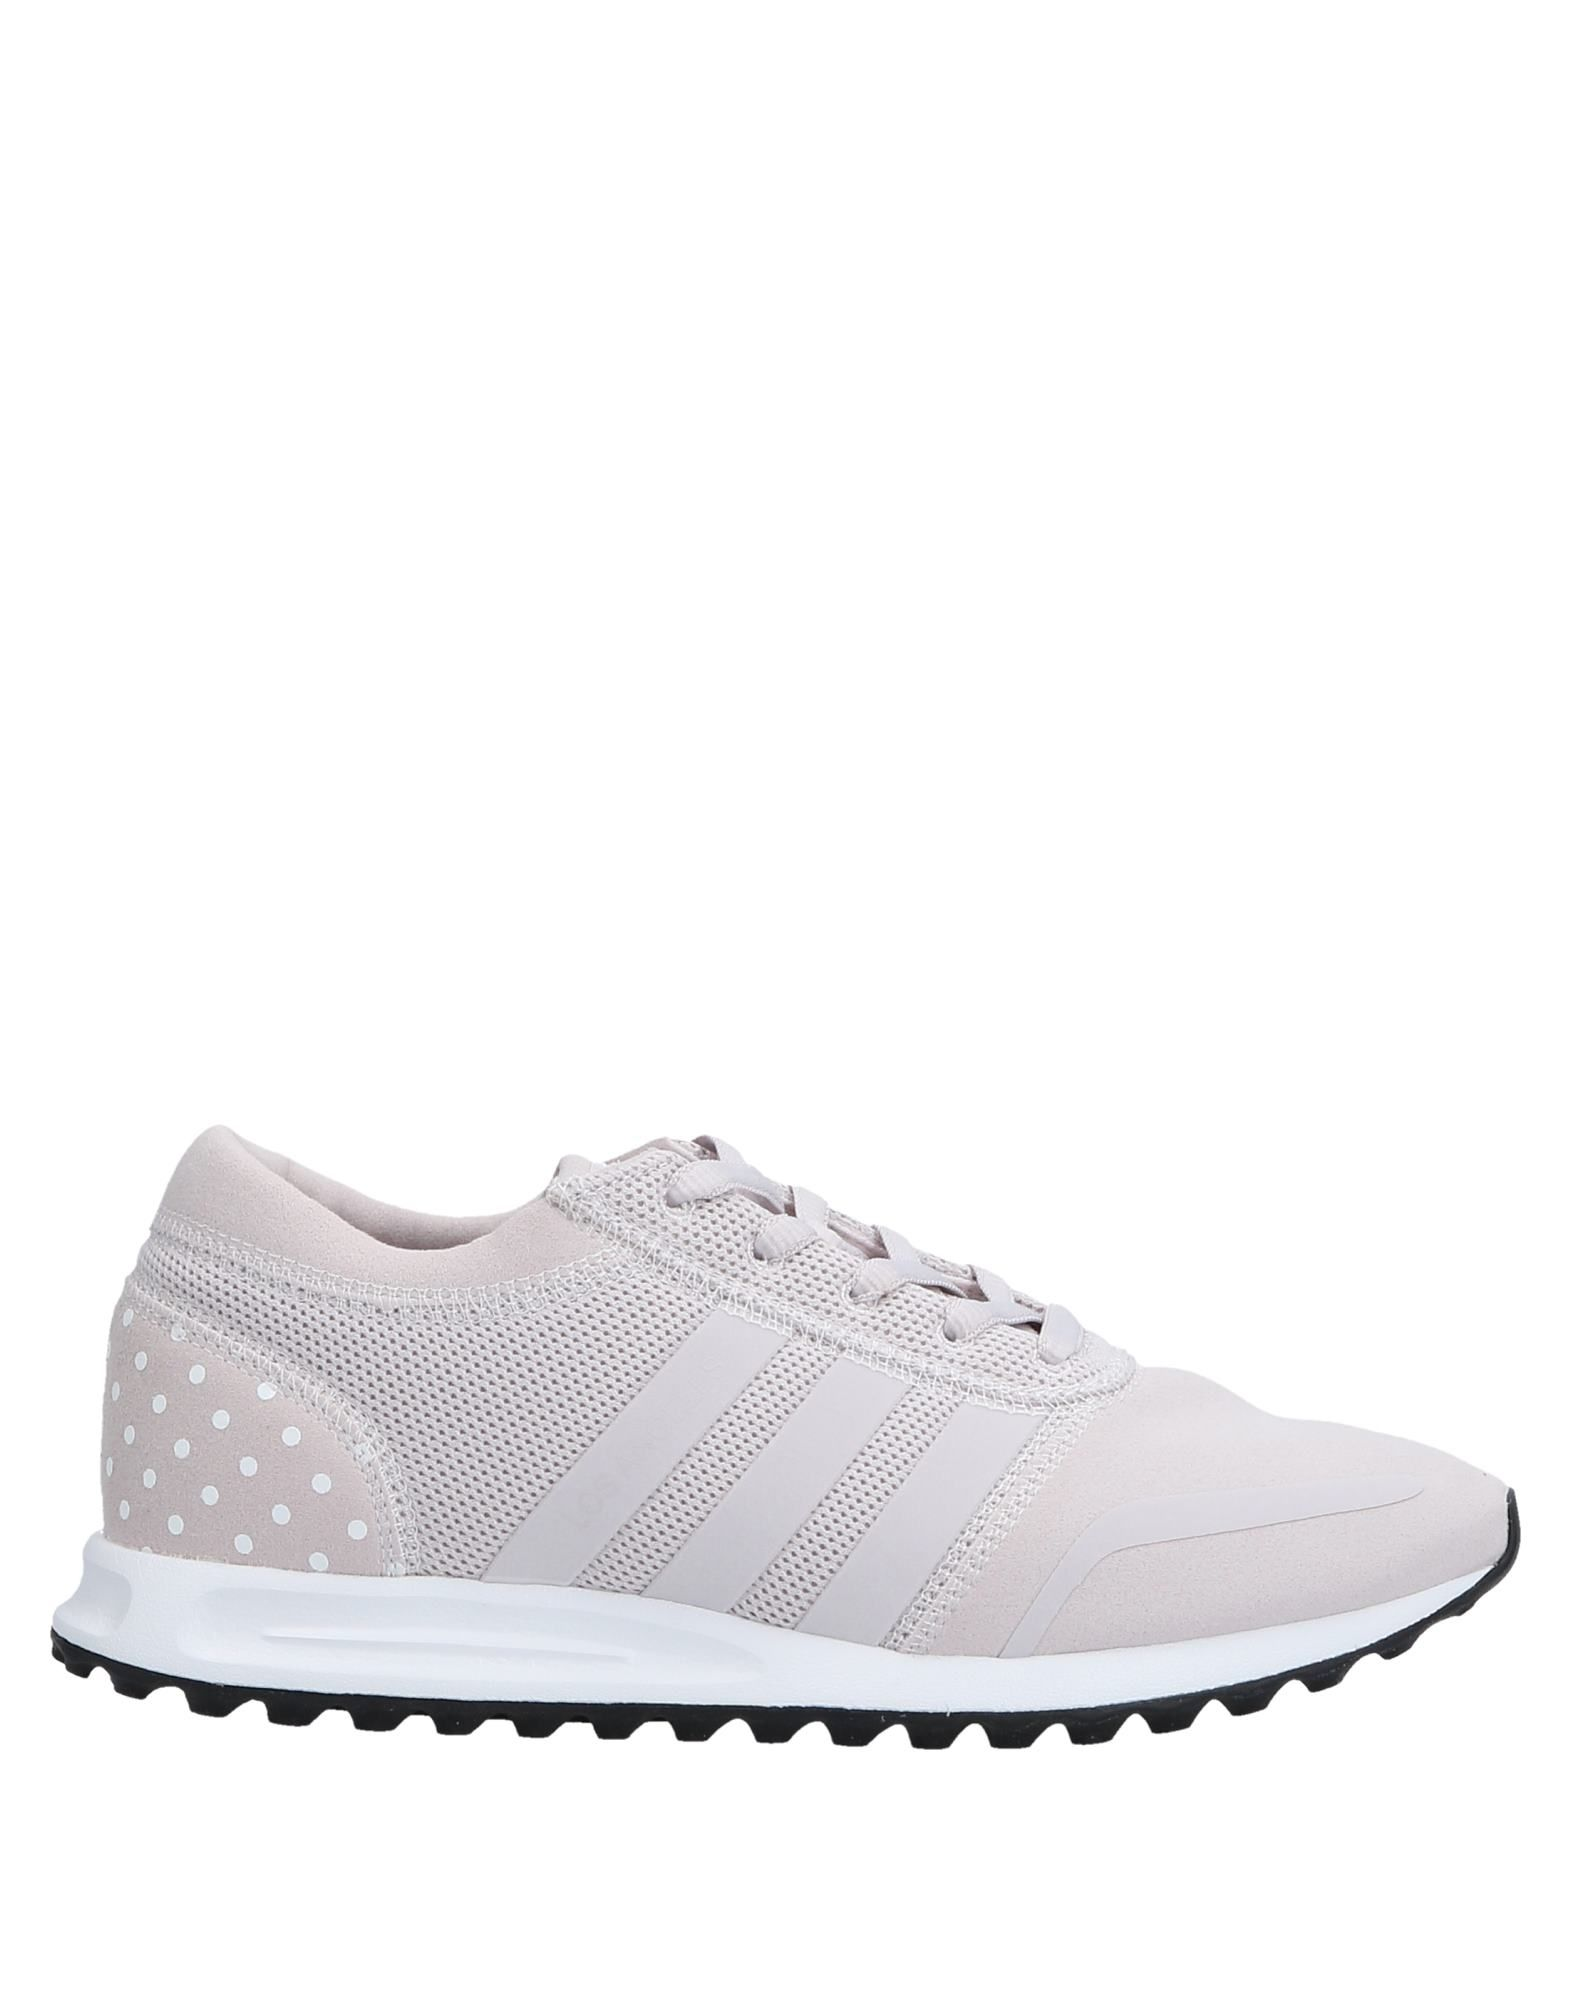 Adidas Originals Damen Sneakers Damen Originals  11531342ER Neue Schuhe 261403